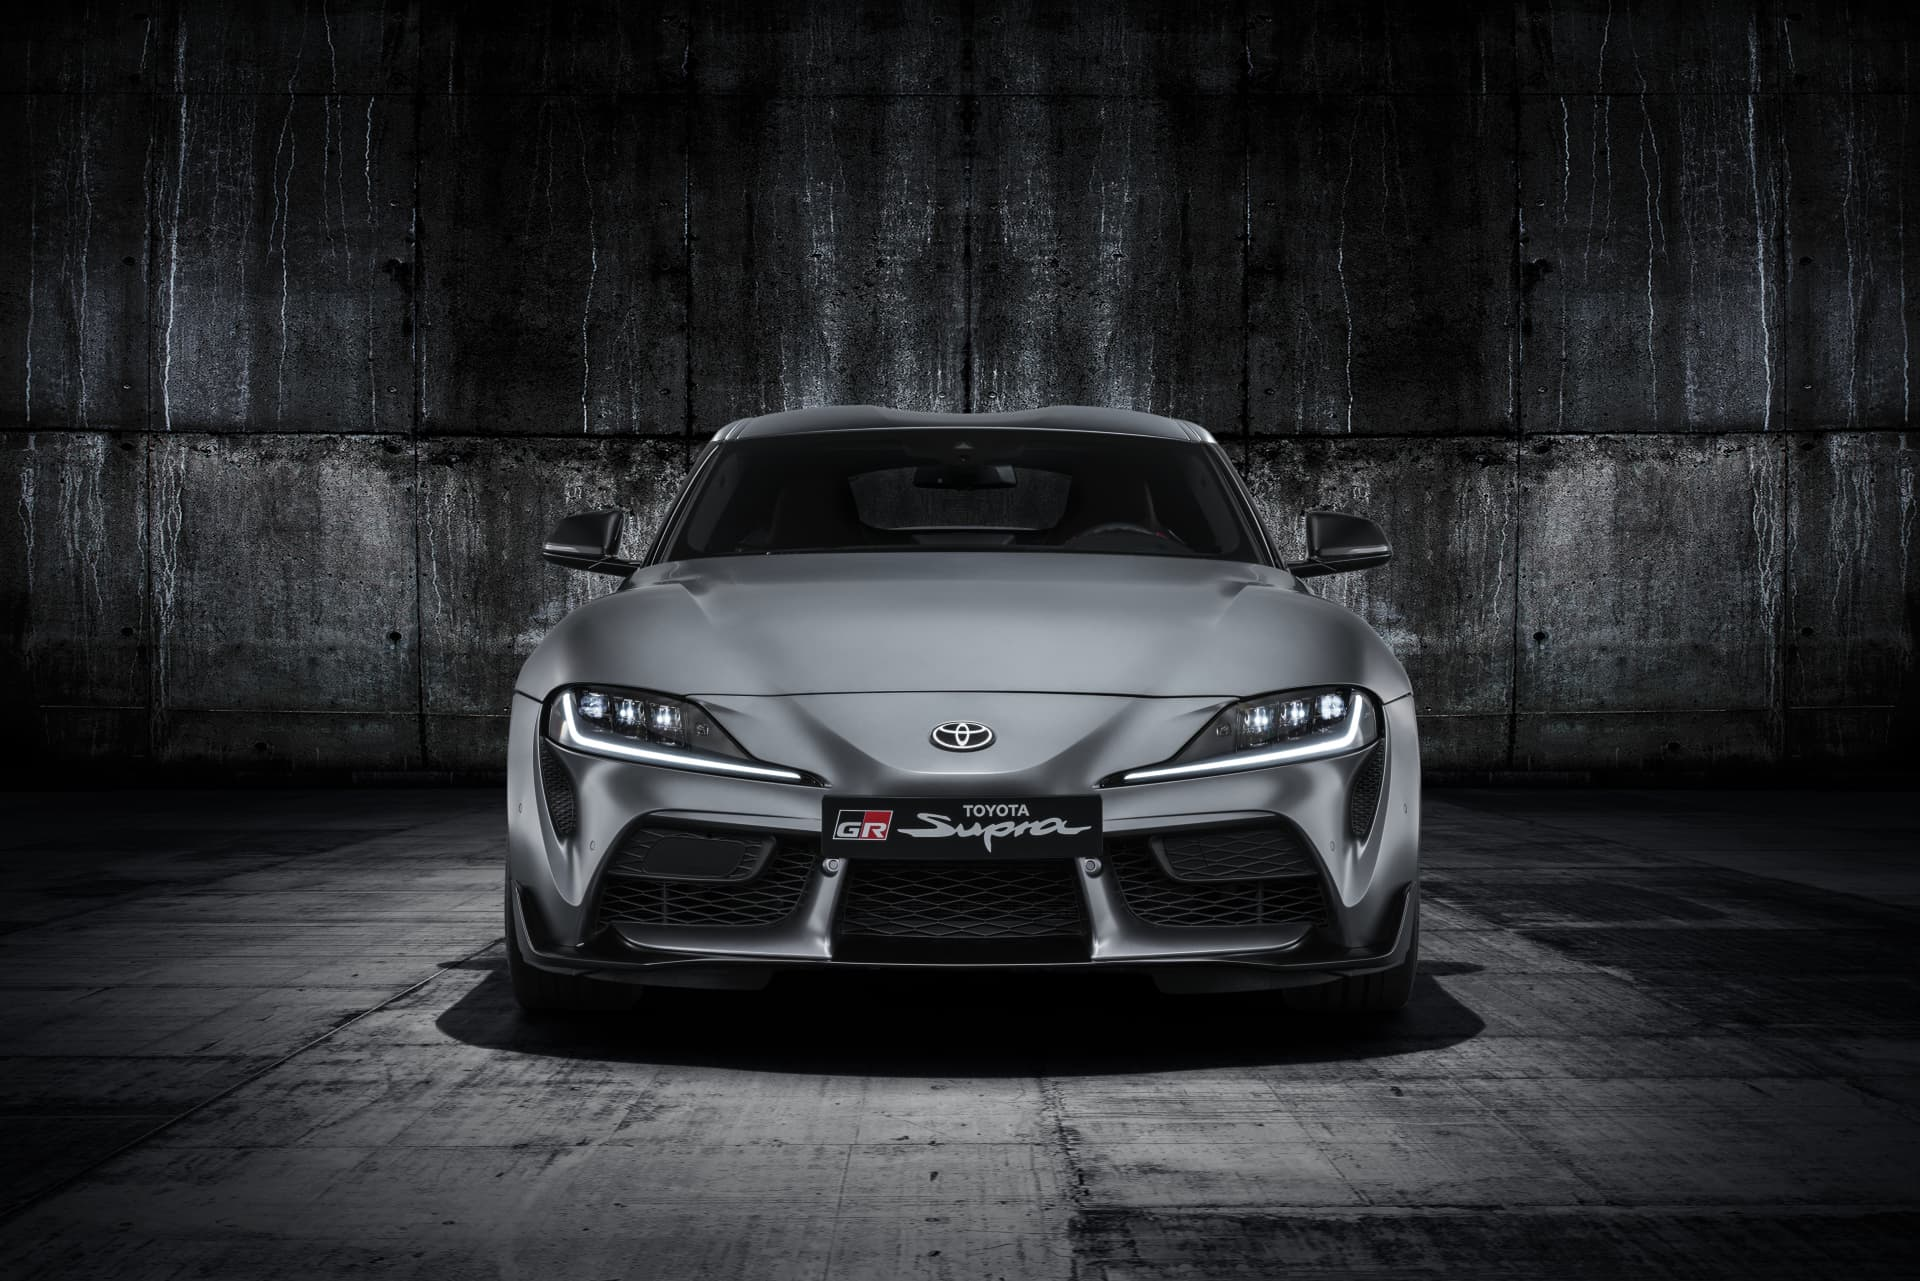 Toyota Supra Gris 2019 Toyota Supra Grey Studio 005 594609